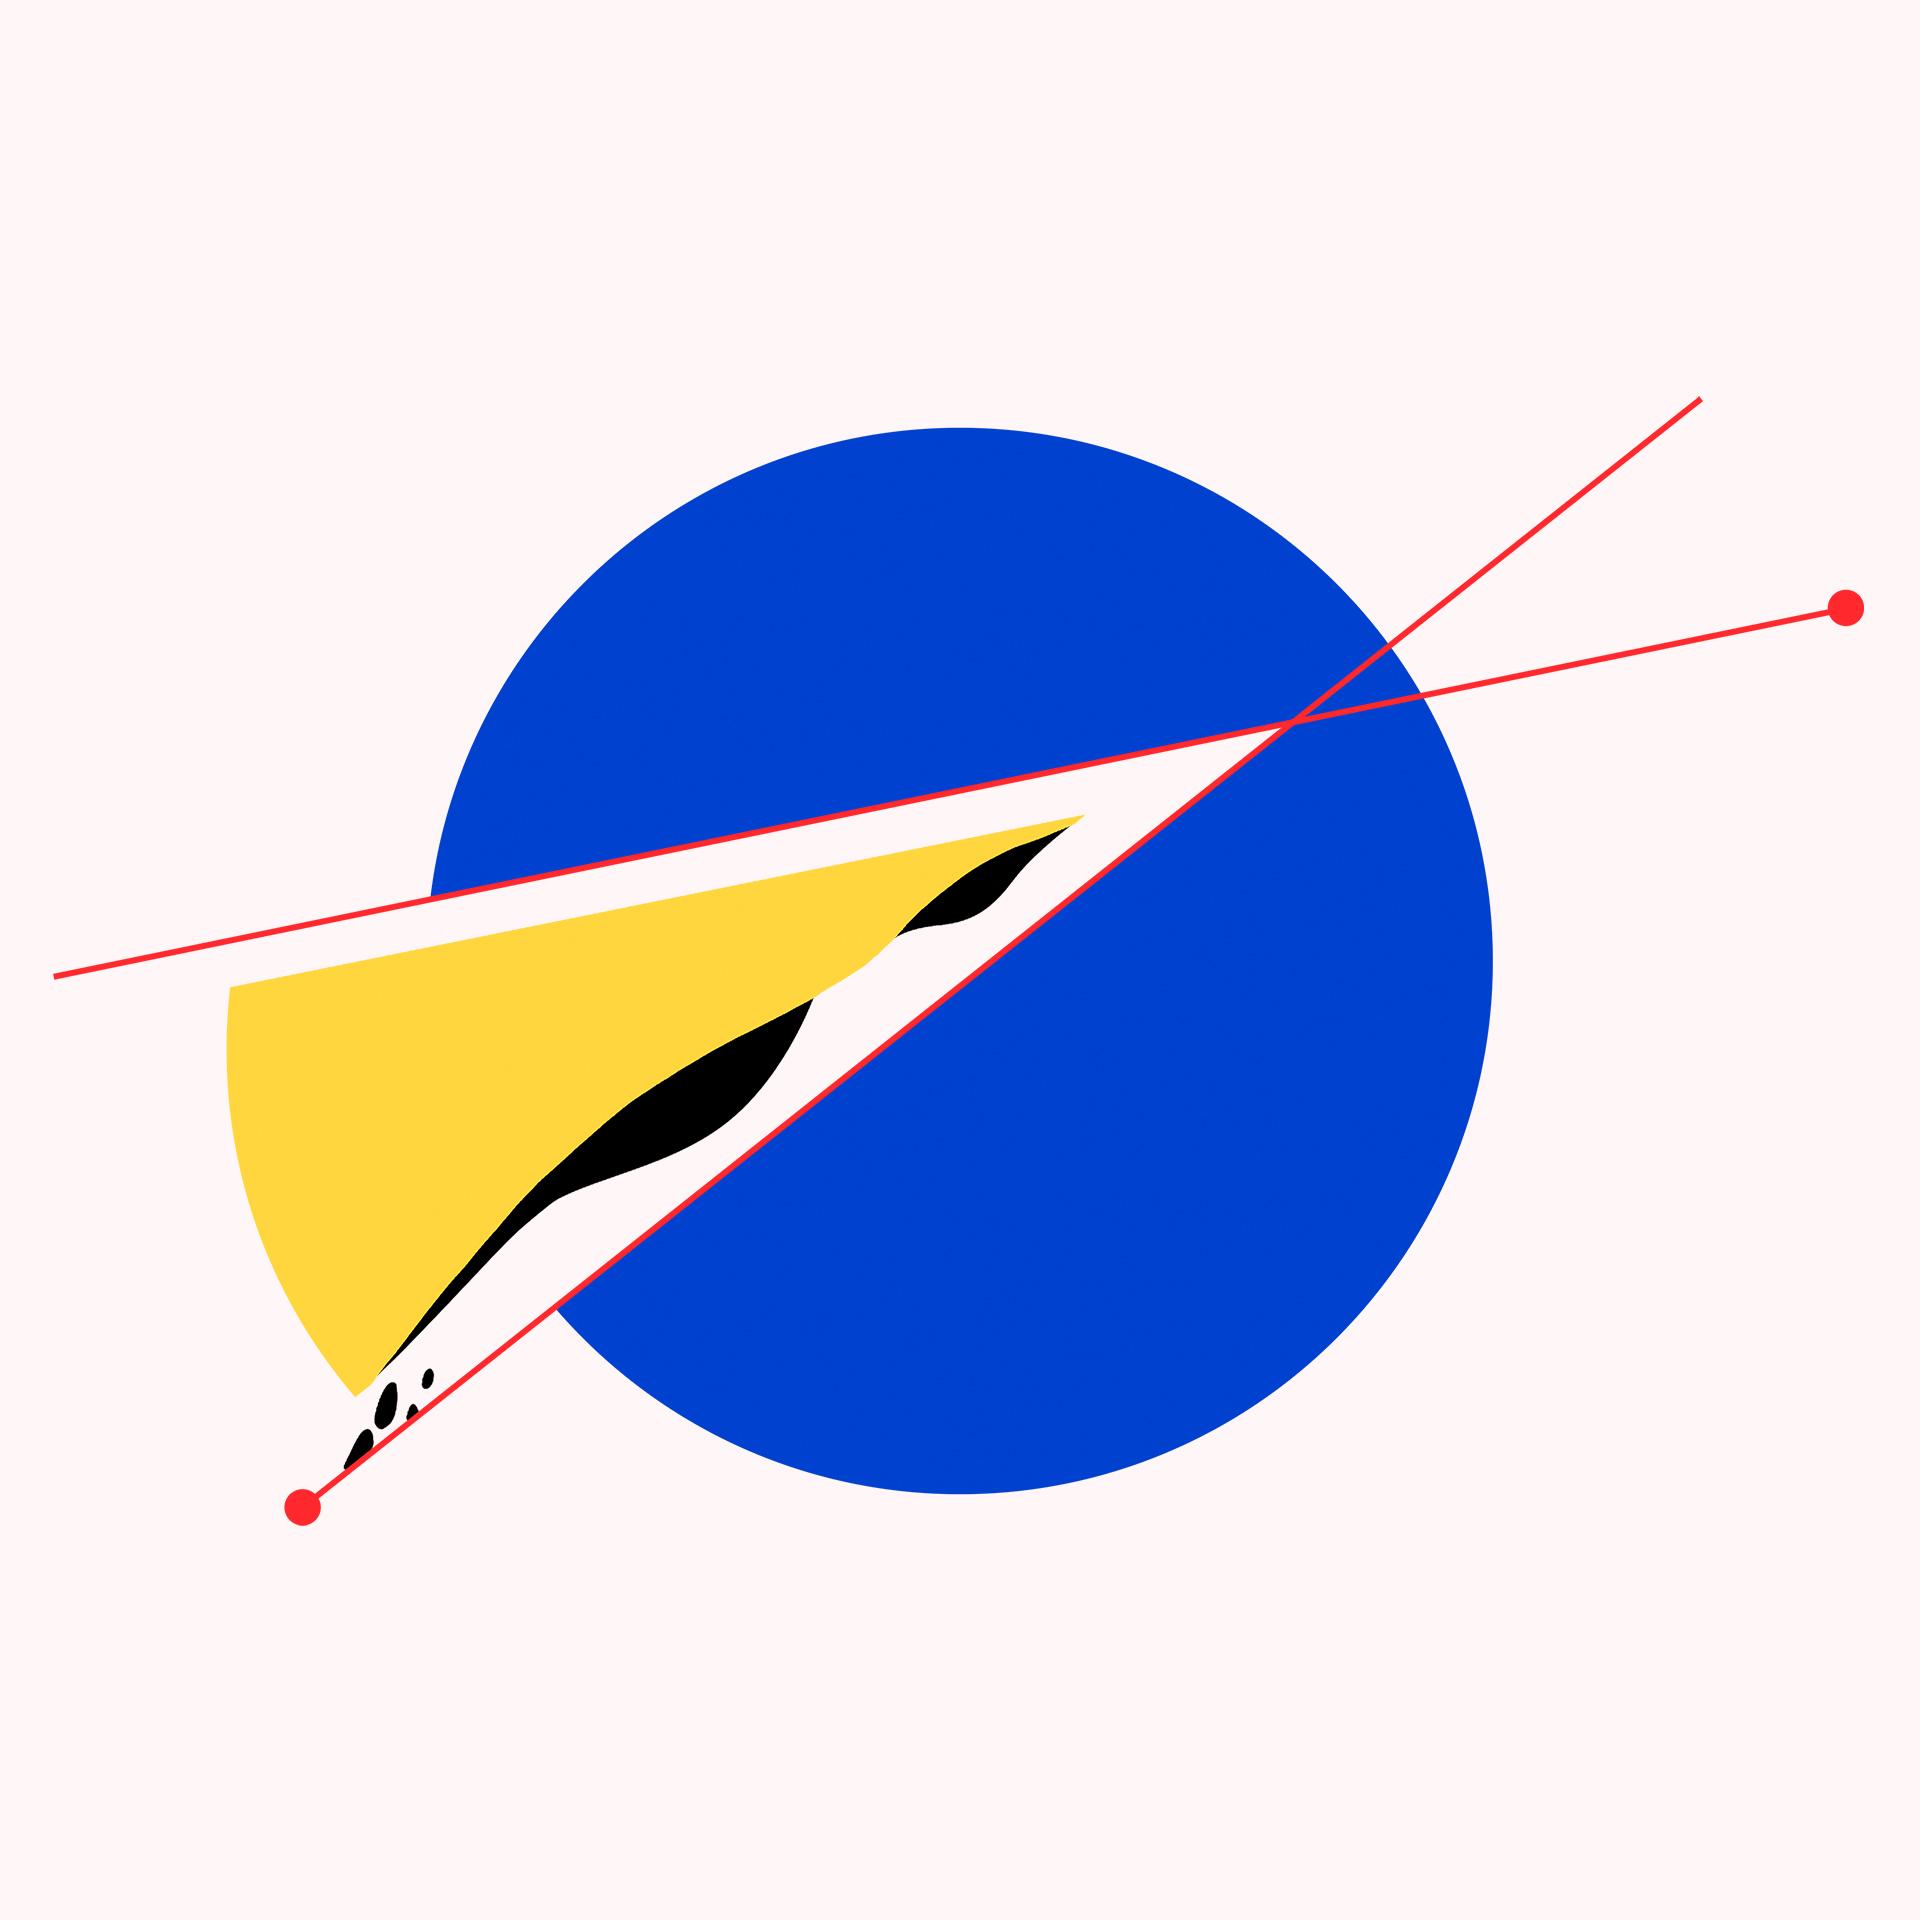 sliced_circle-2.jpg